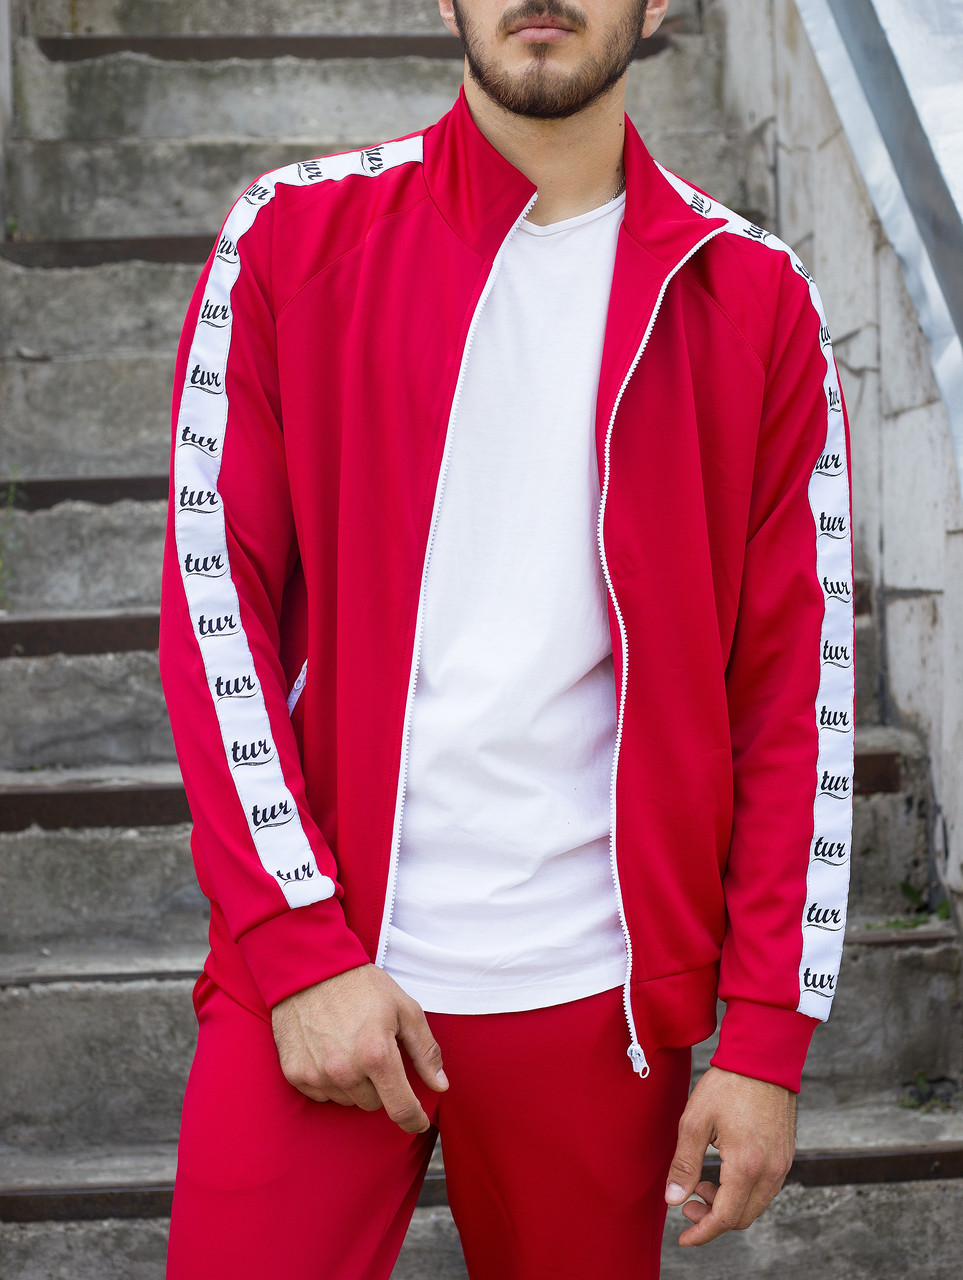 Мастерка олимпийка мужская красная бренд ТУР модель Смоук (Smoke) размер XS, S, M, L, XL